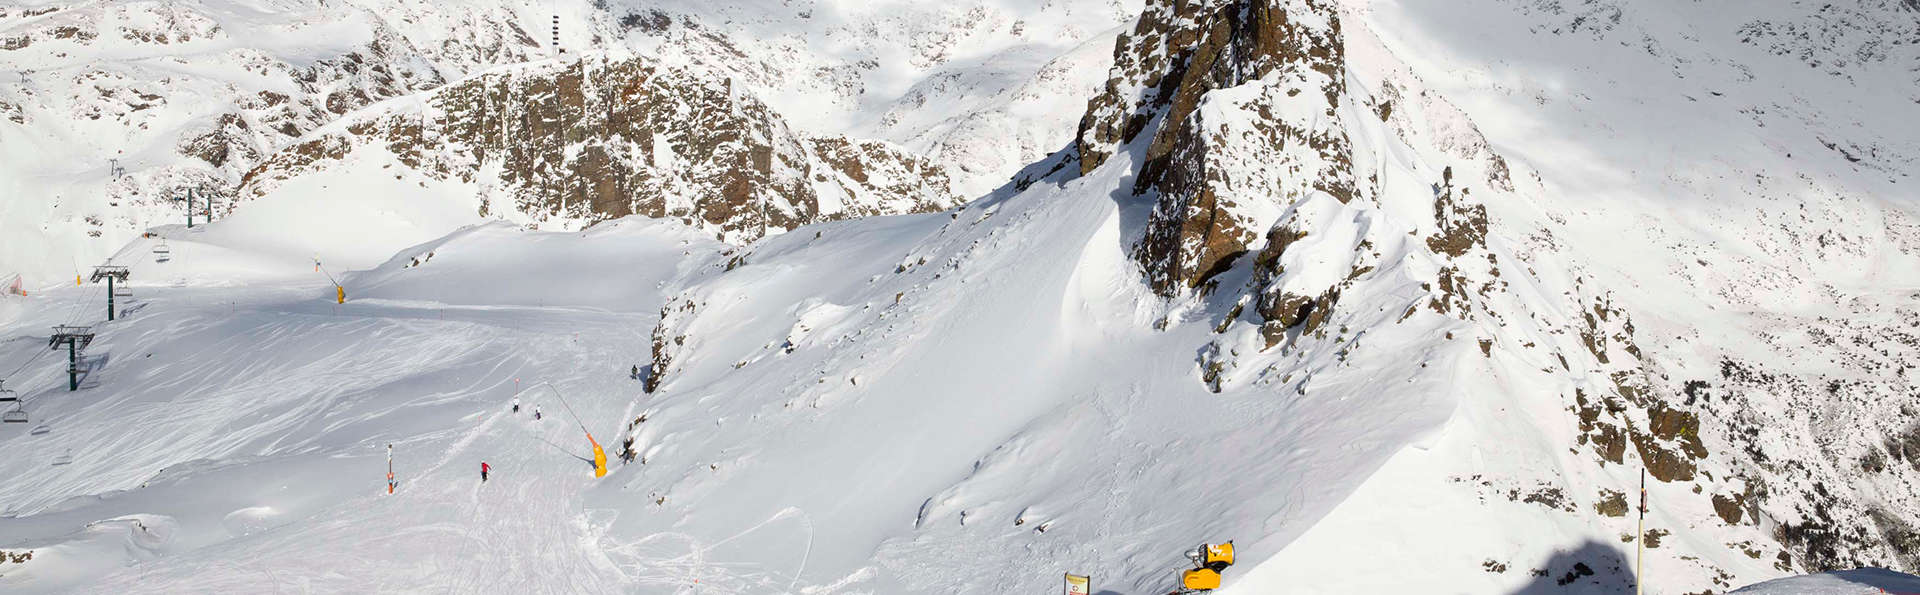 Llamamiento a esquiadores: Fin de semana a pie de pistas de Vallnord con forfait de 2 días